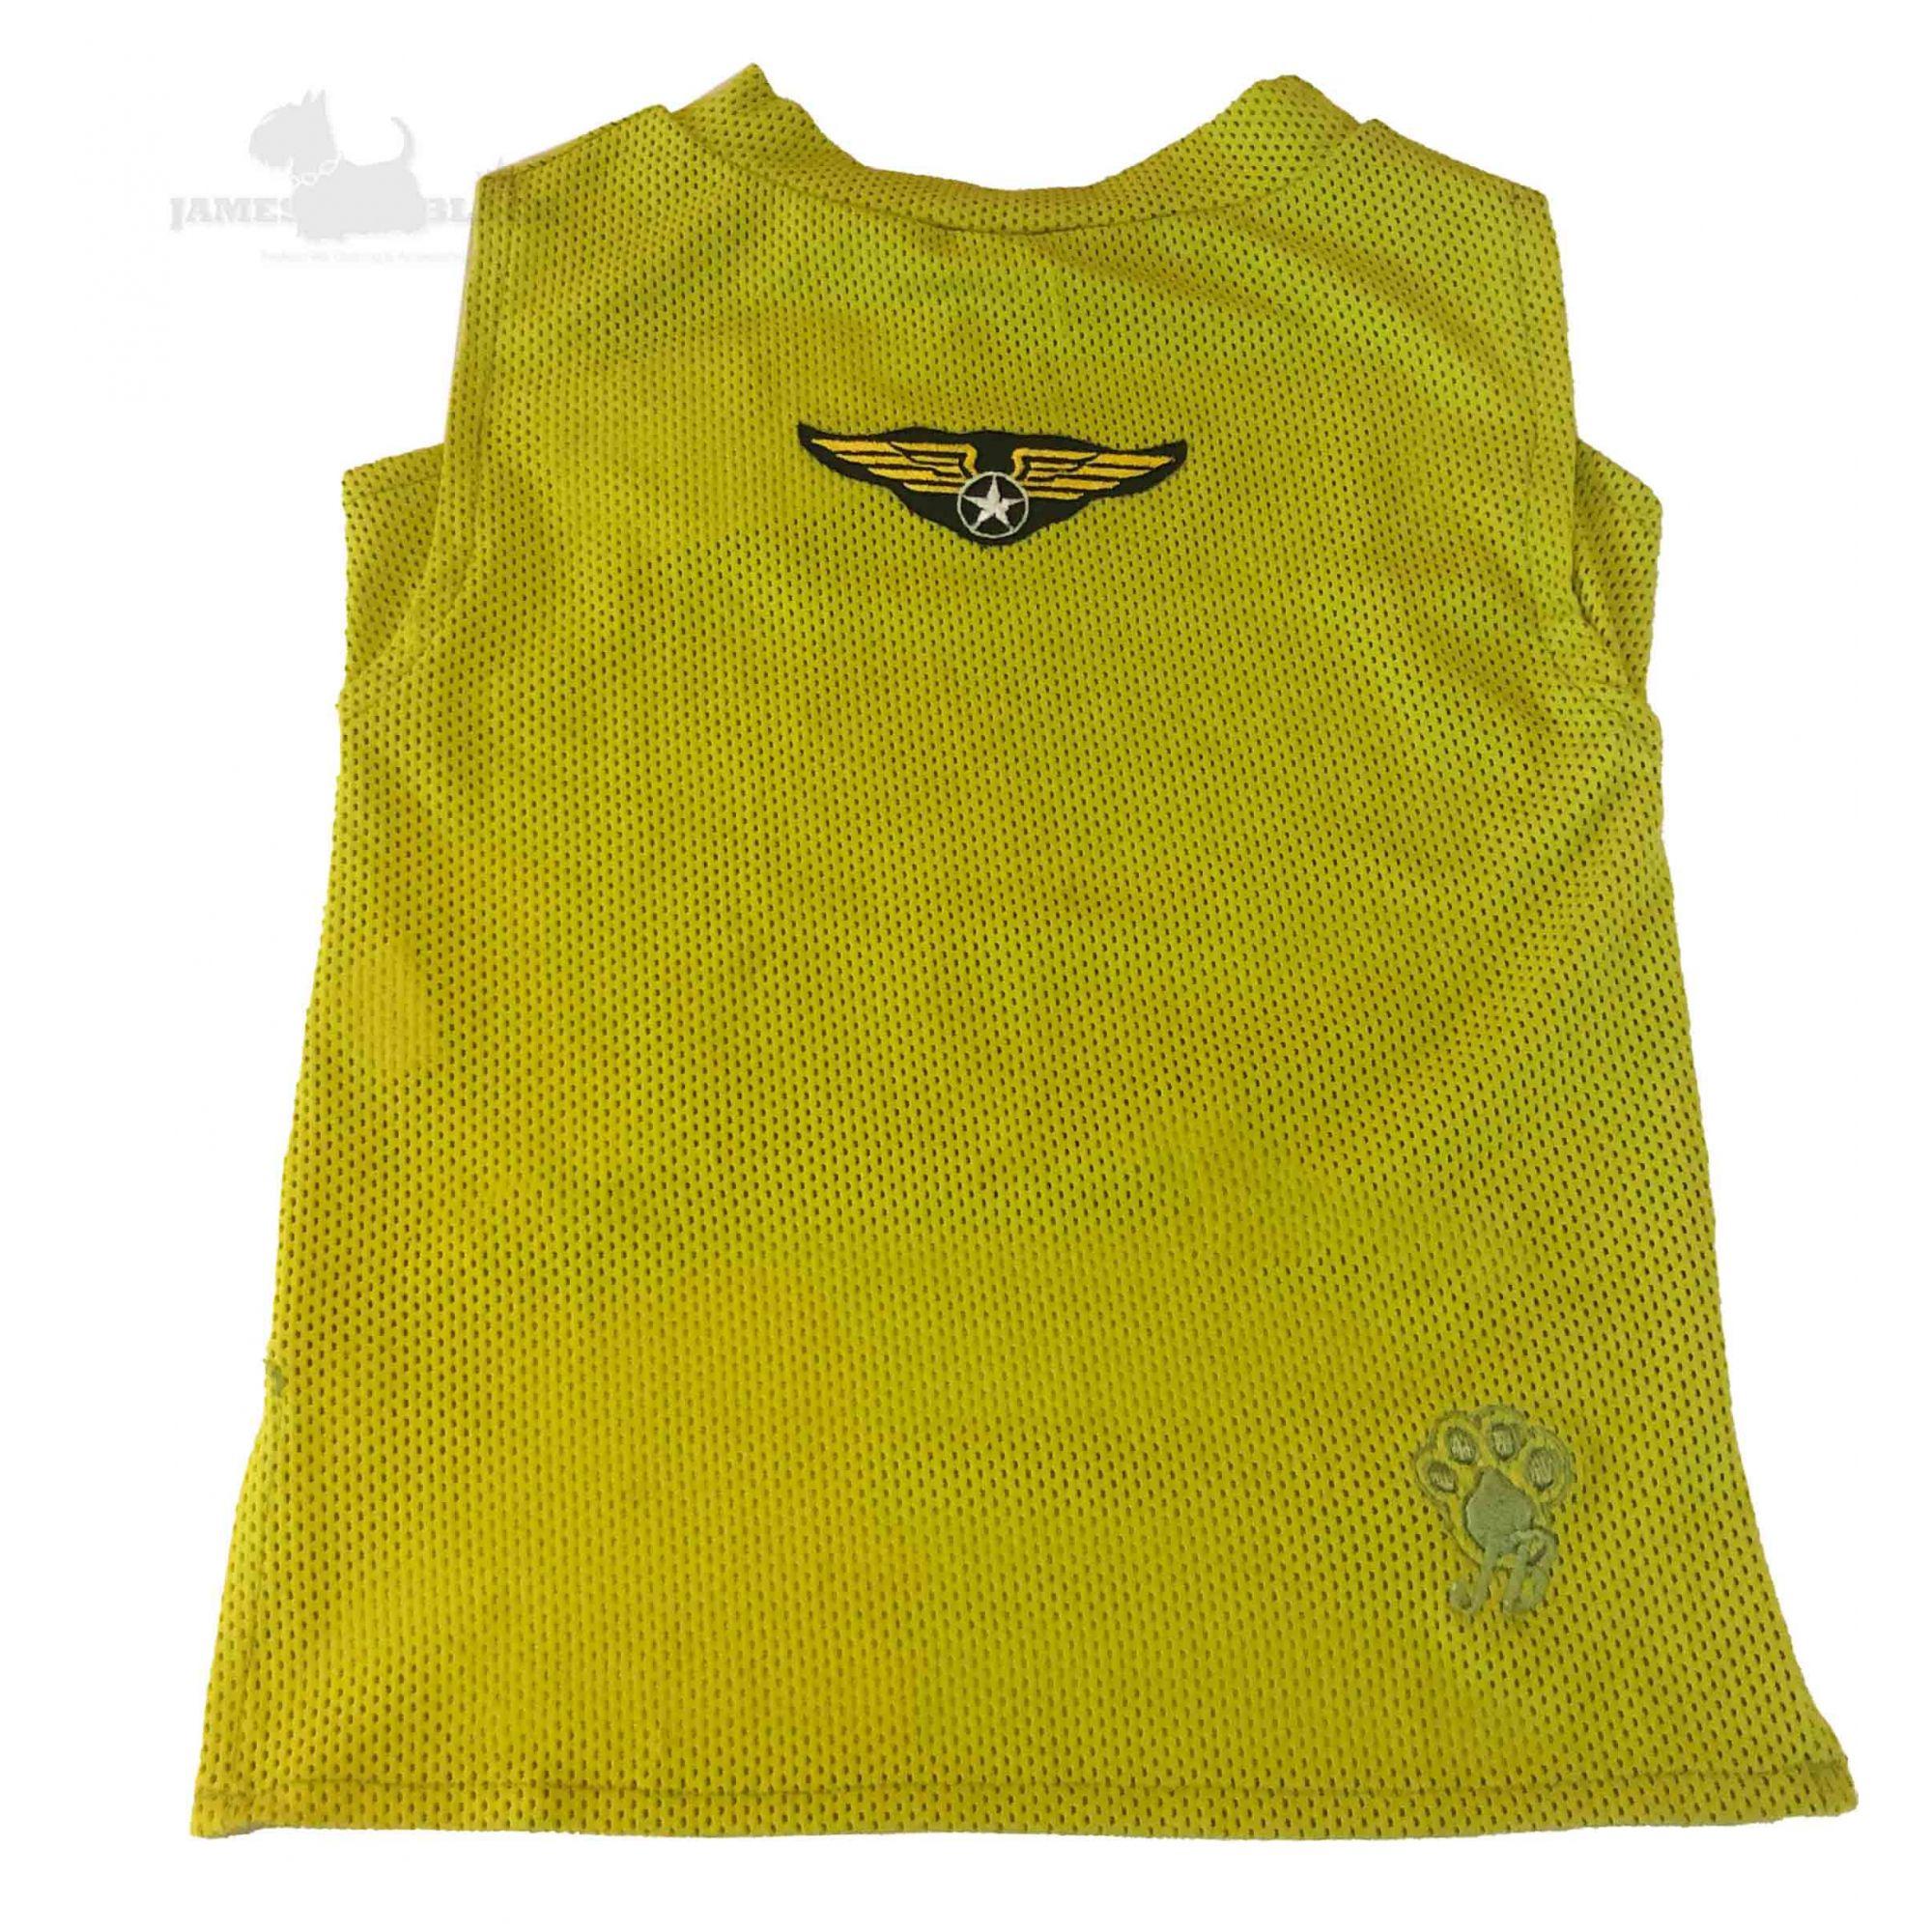 Camiseta Dryfit Mostarda Furos Medios e Patch Militar